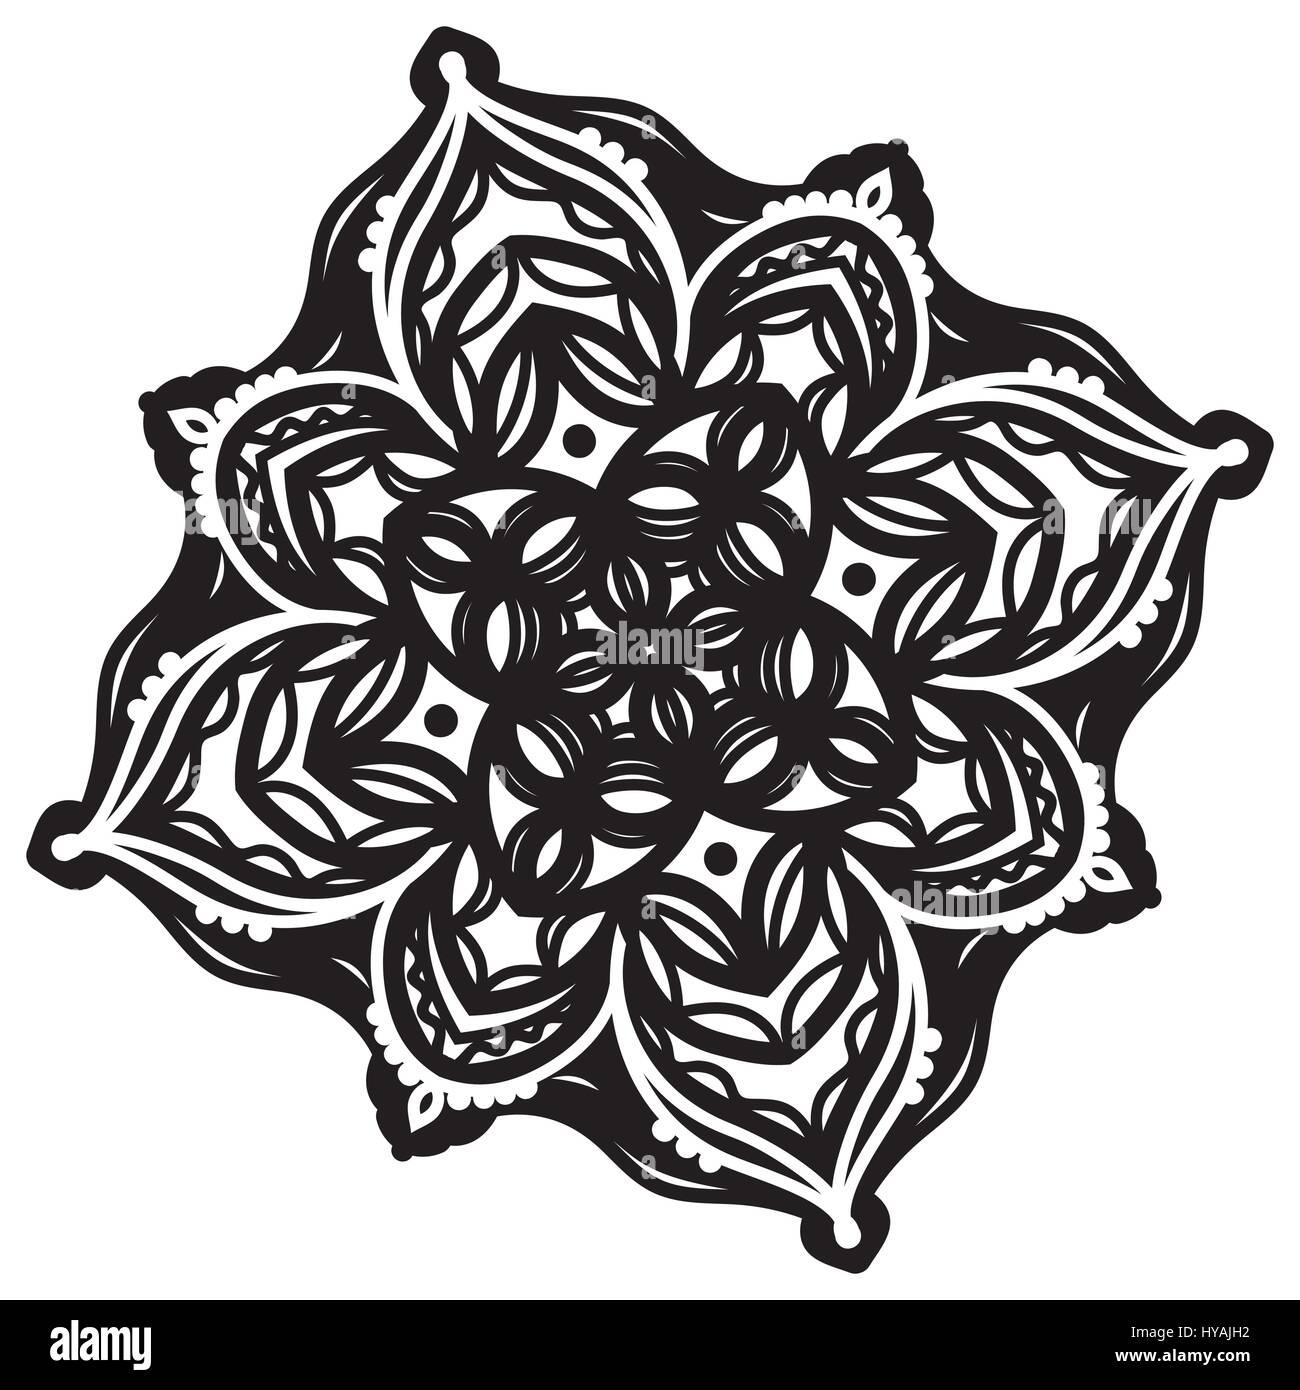 Abstract mandala design - Stock Image